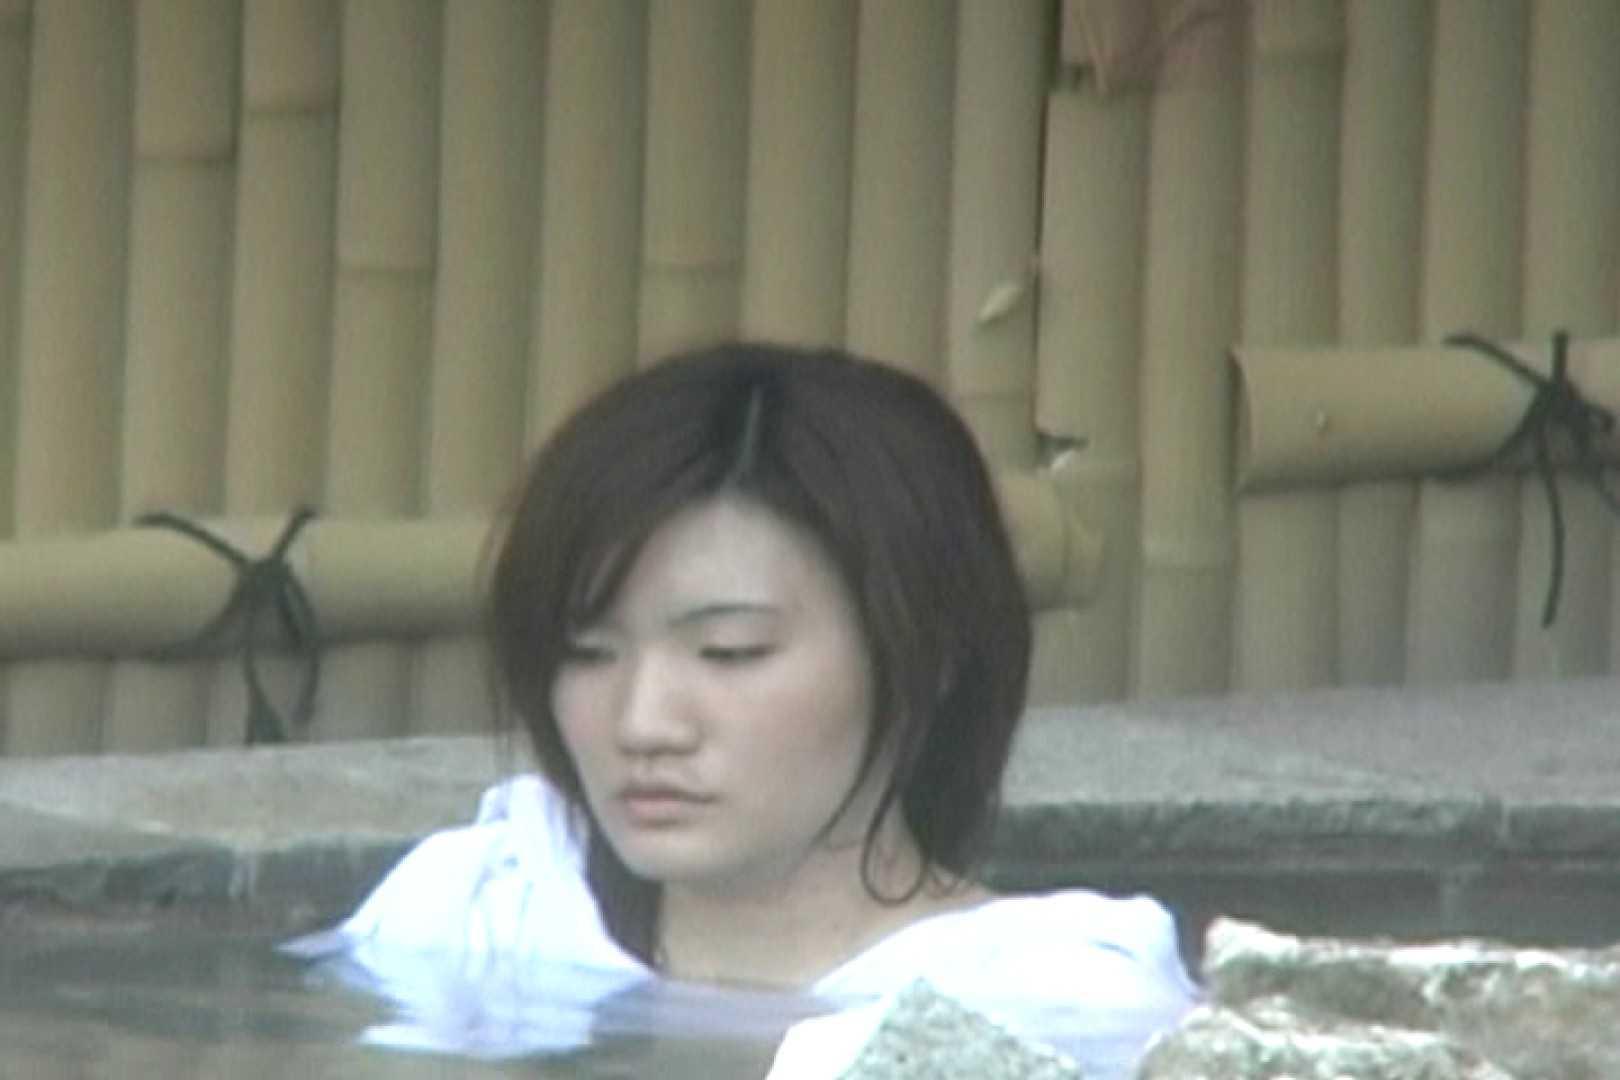 Aquaな露天風呂Vol.590 露天 AV無料 112pic 44